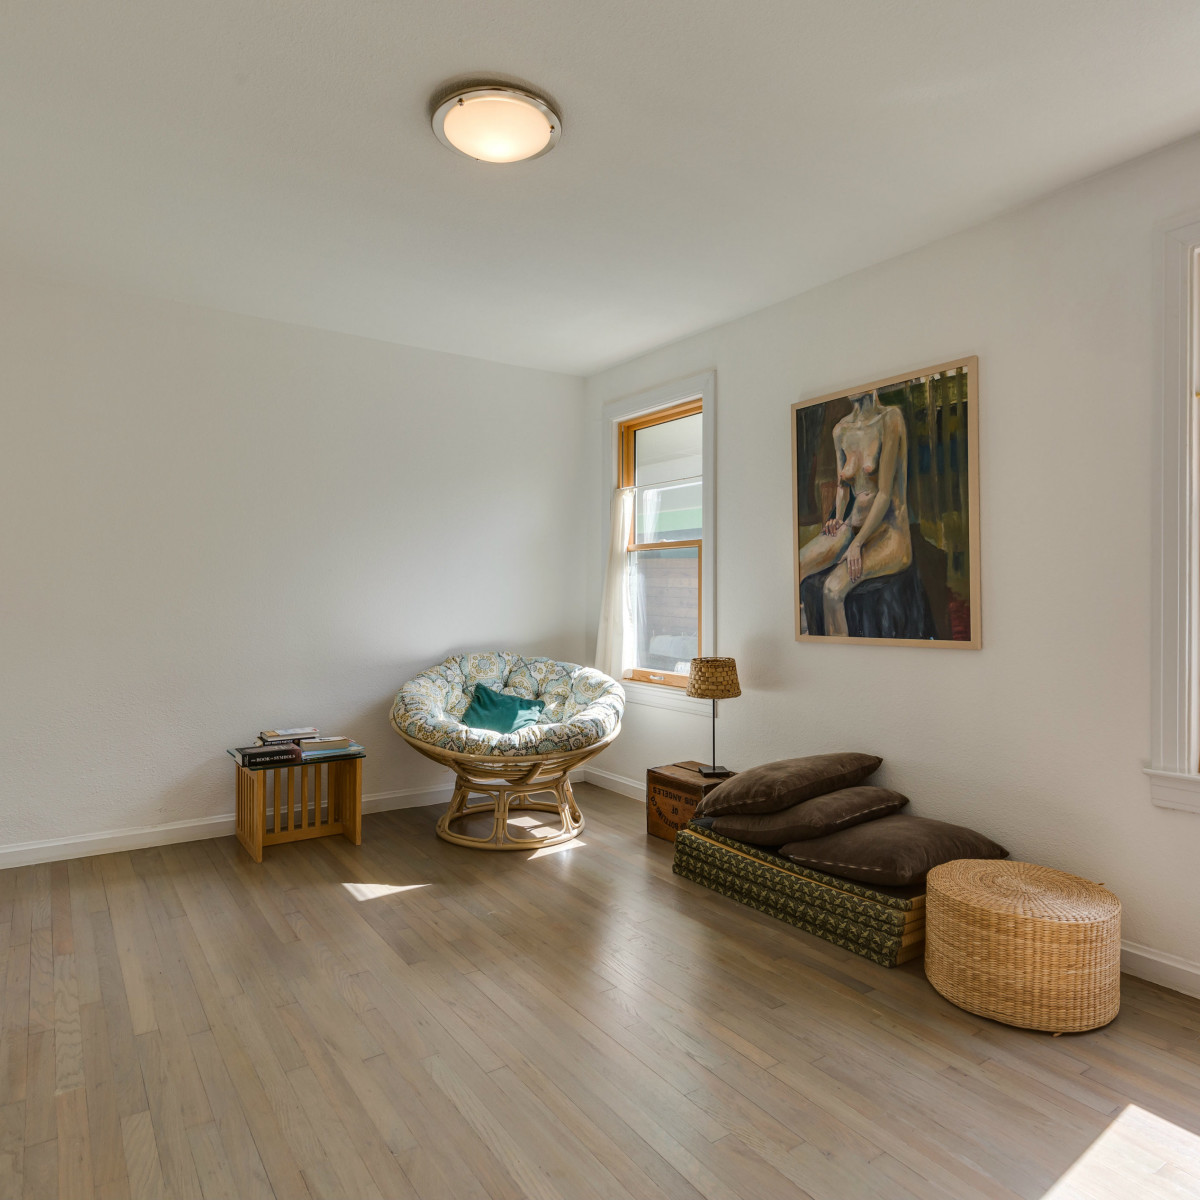 115 W Castano San Antonio house for sale bedroom